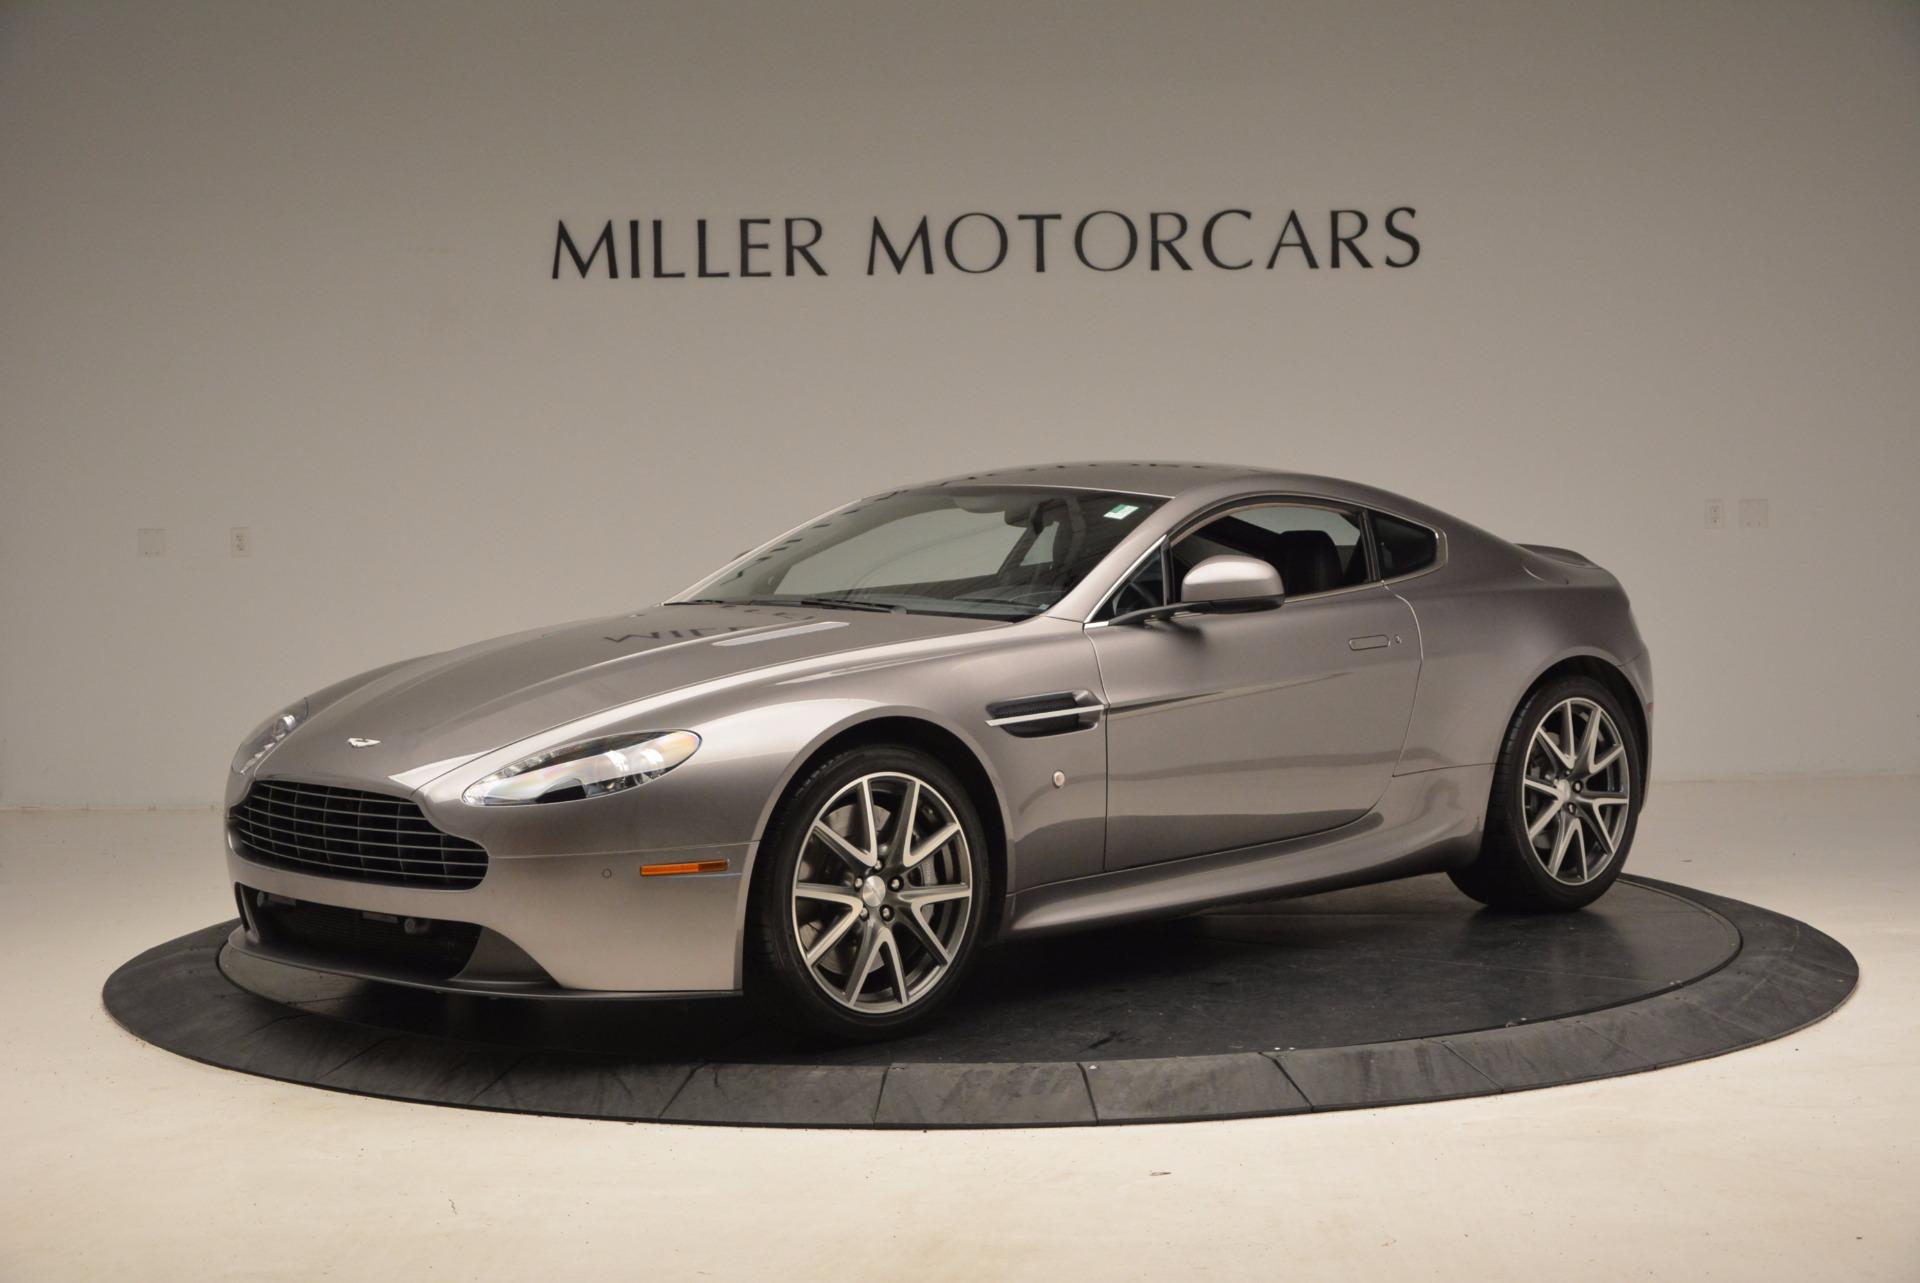 Used 2012 Aston Martin V8 Vantage  For Sale In Greenwich, CT. Alfa Romeo of Greenwich, 7263 1497_p2